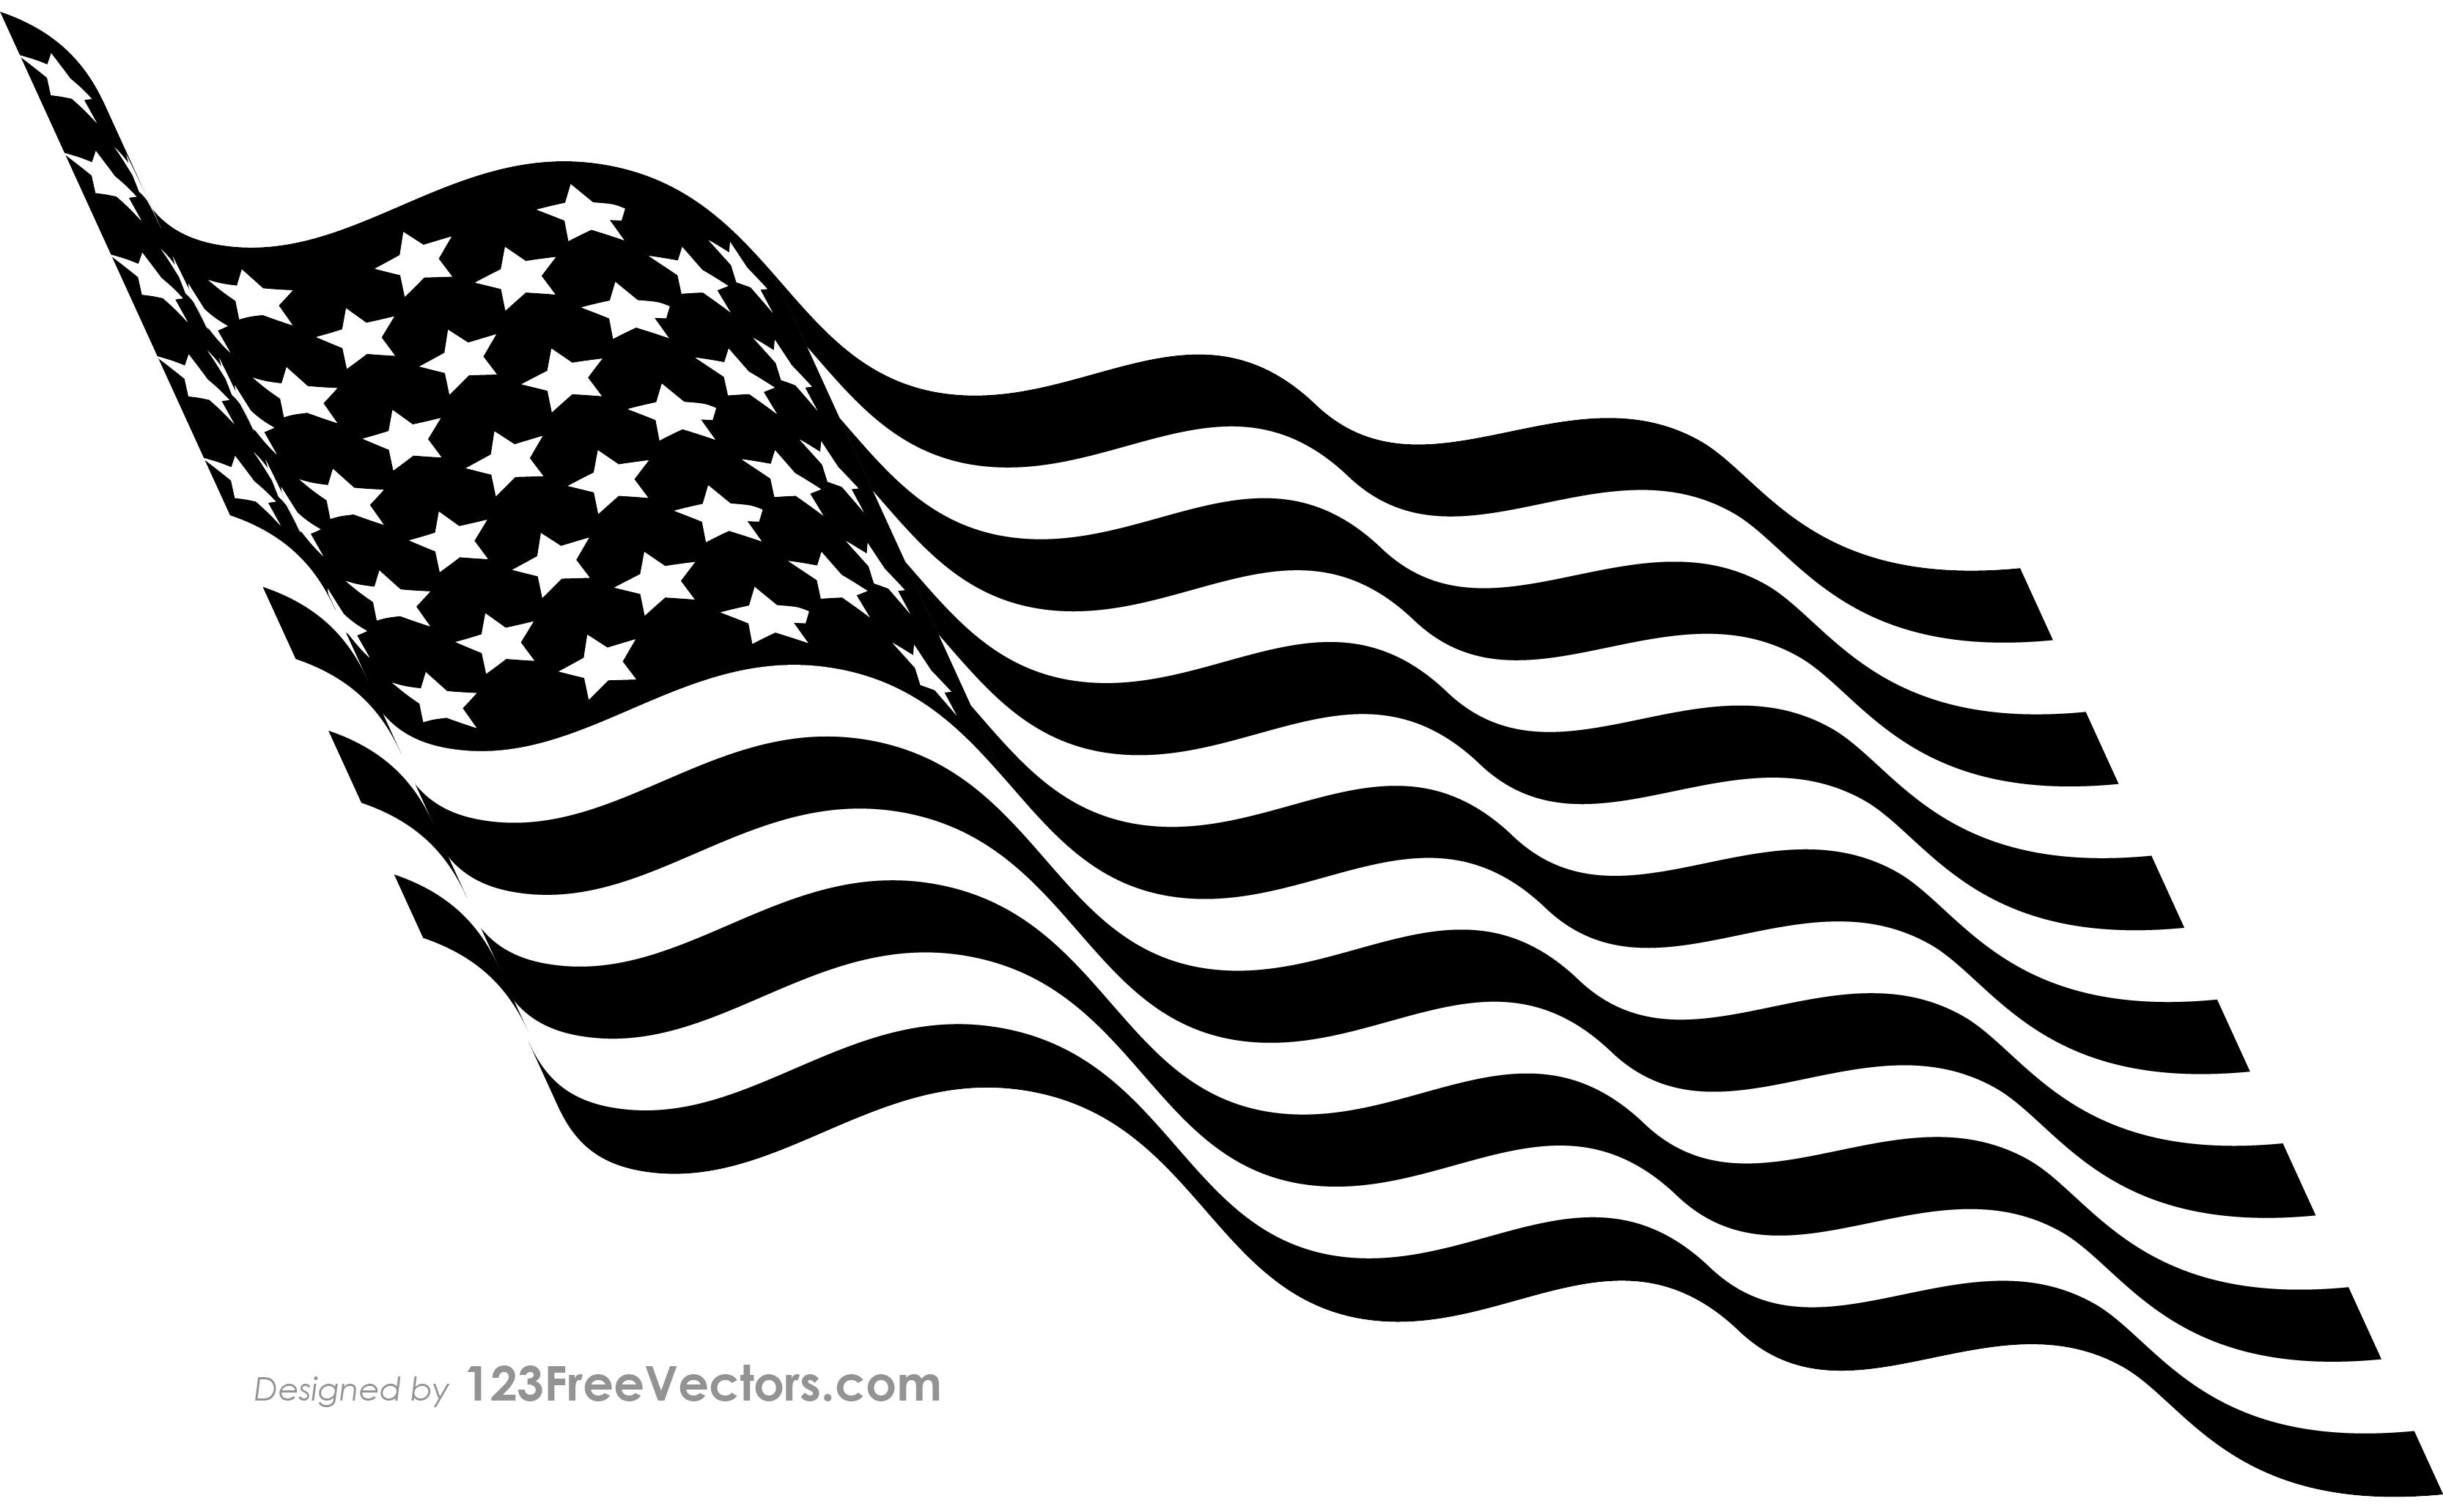 Usa Flag Clip Art at Clker.com - vector clip art online, royalty free &  public domain